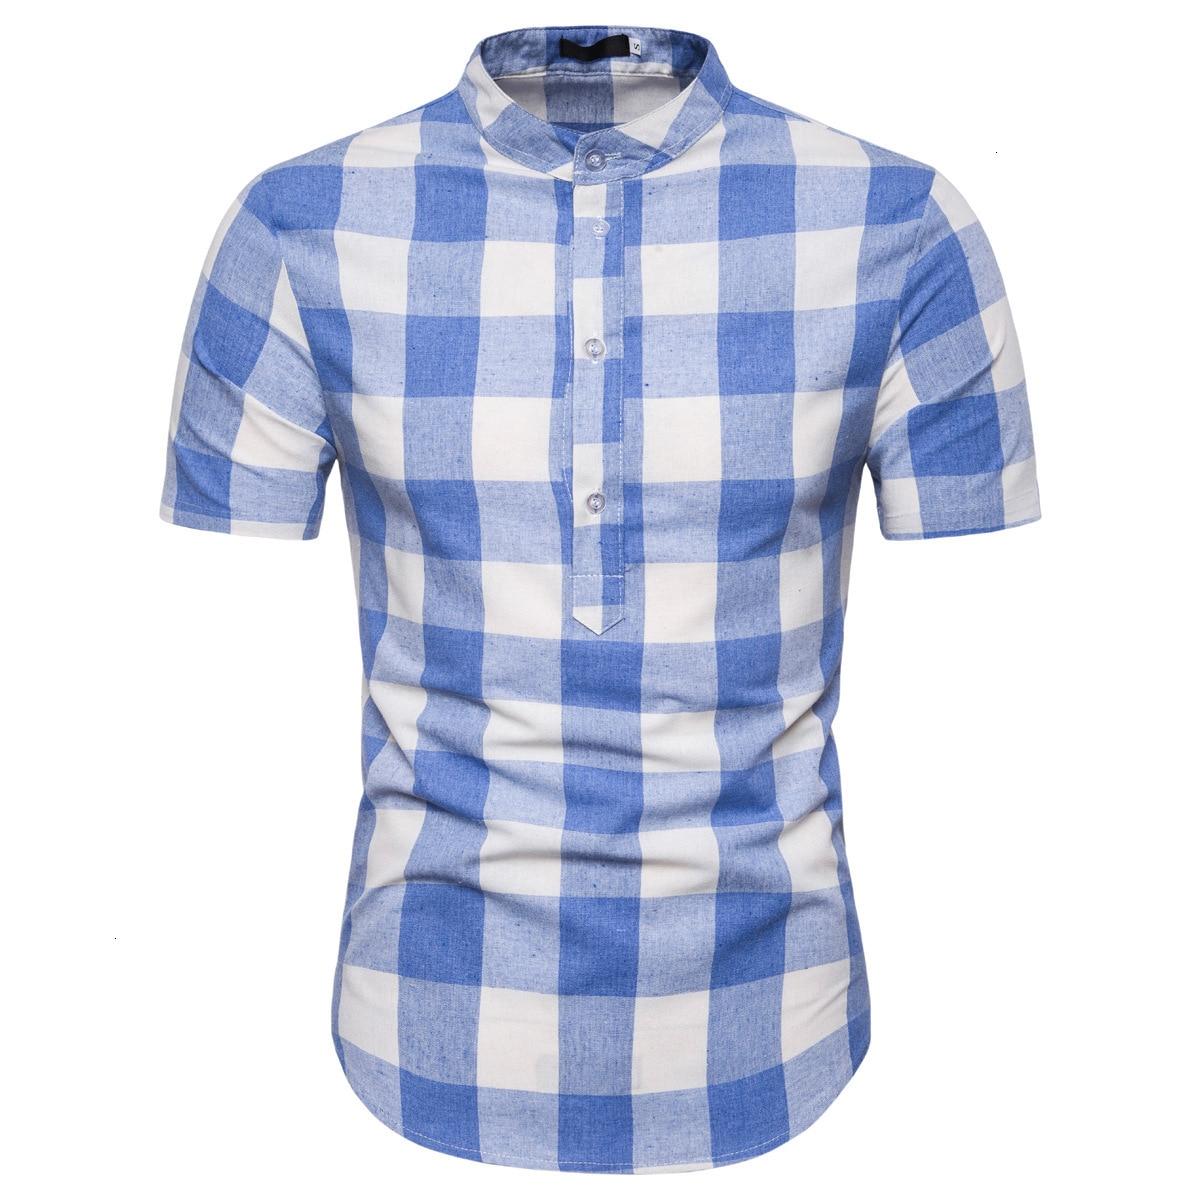 2019 New Men Plaid Shirt Collar Shirt Print Short Sleeve The Code